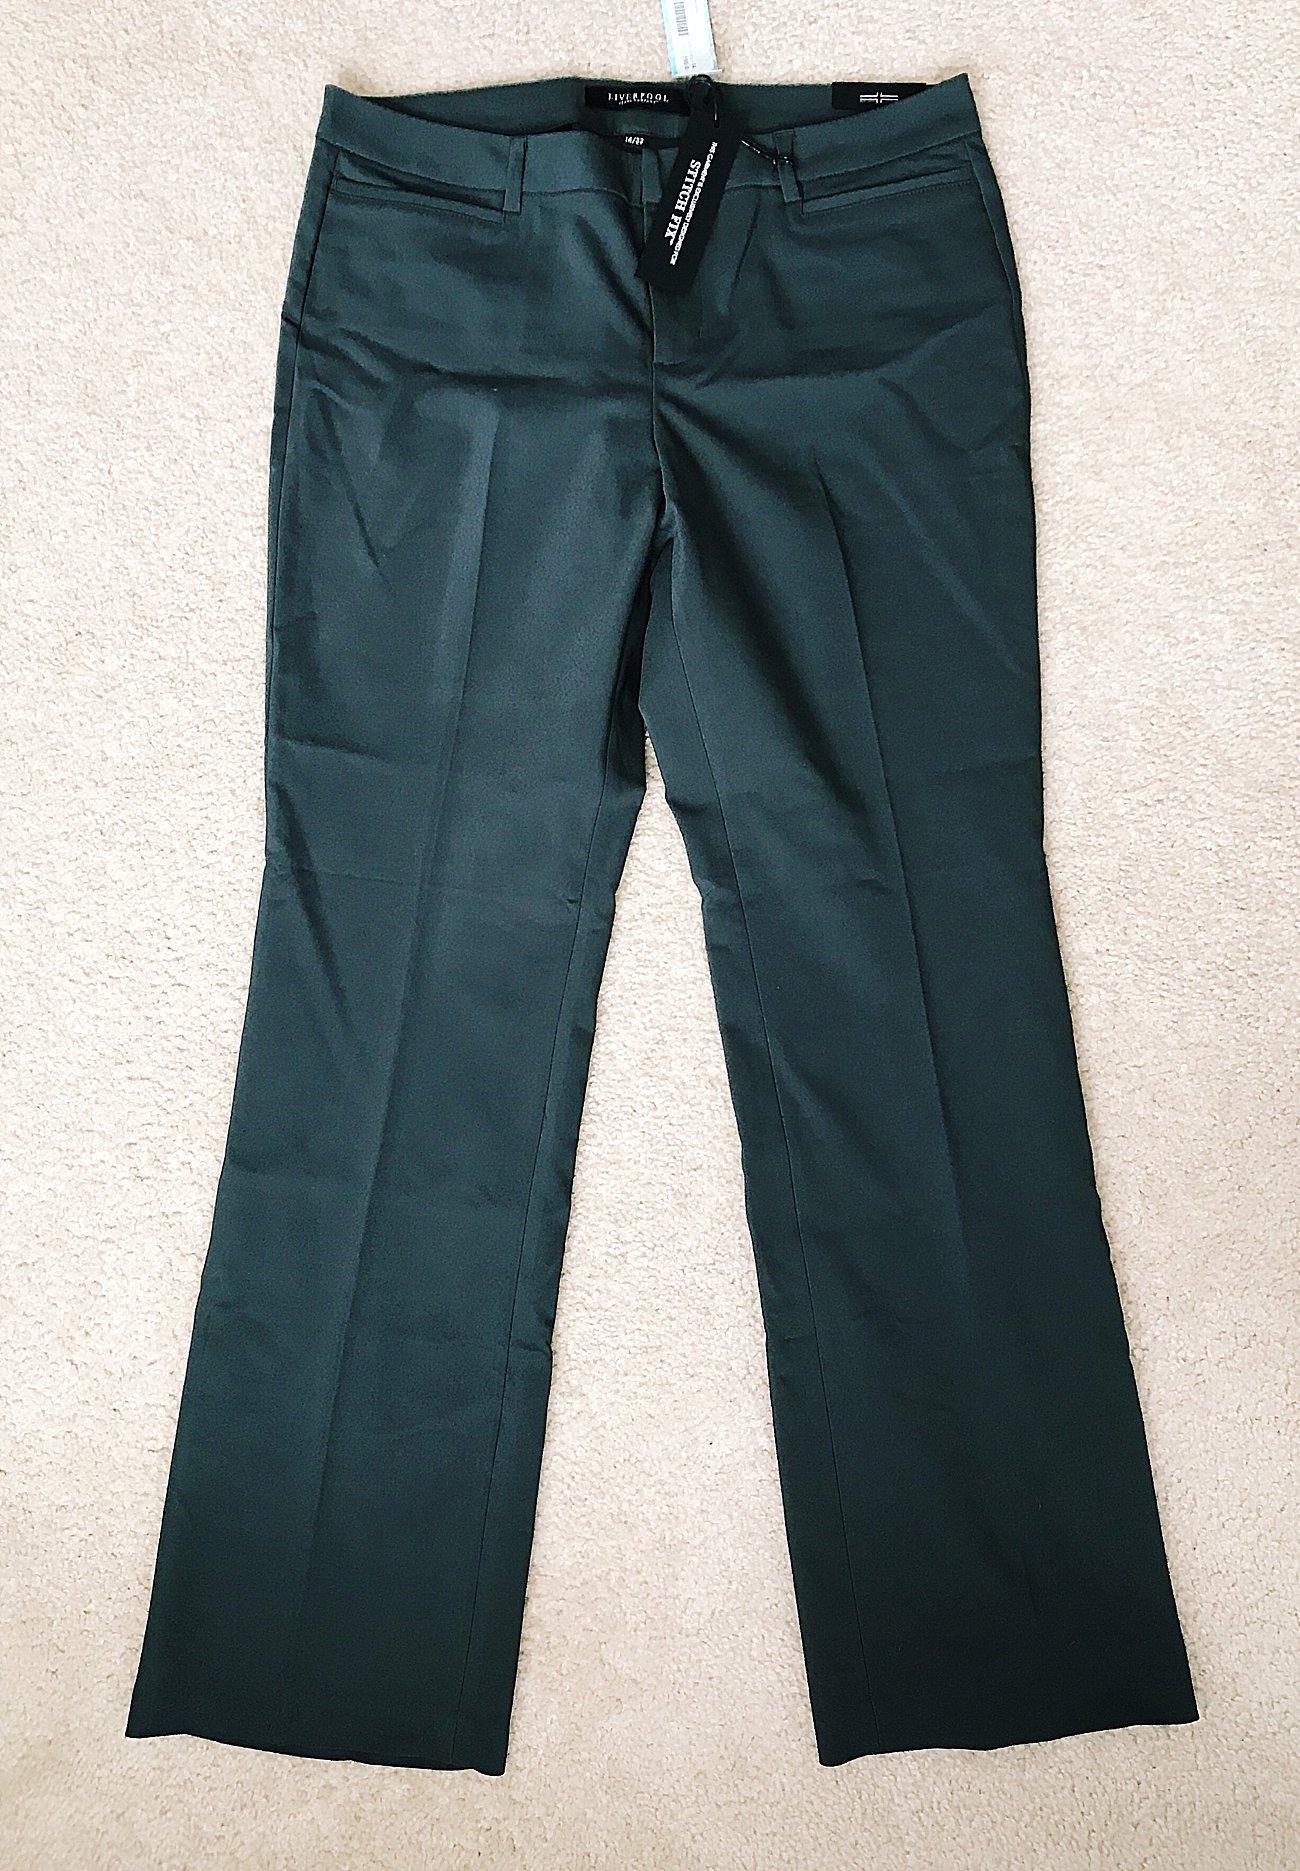 "Liverpool ""Harper Bootcut Pant"" - Size 14 / 32 - $88"